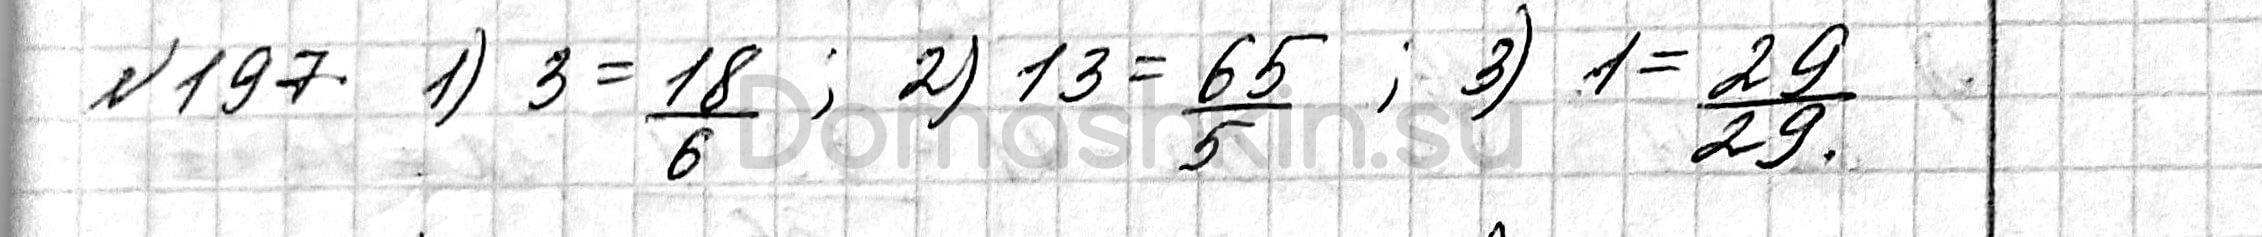 Математика 6 класс учебник Мерзляк номер 197 решение